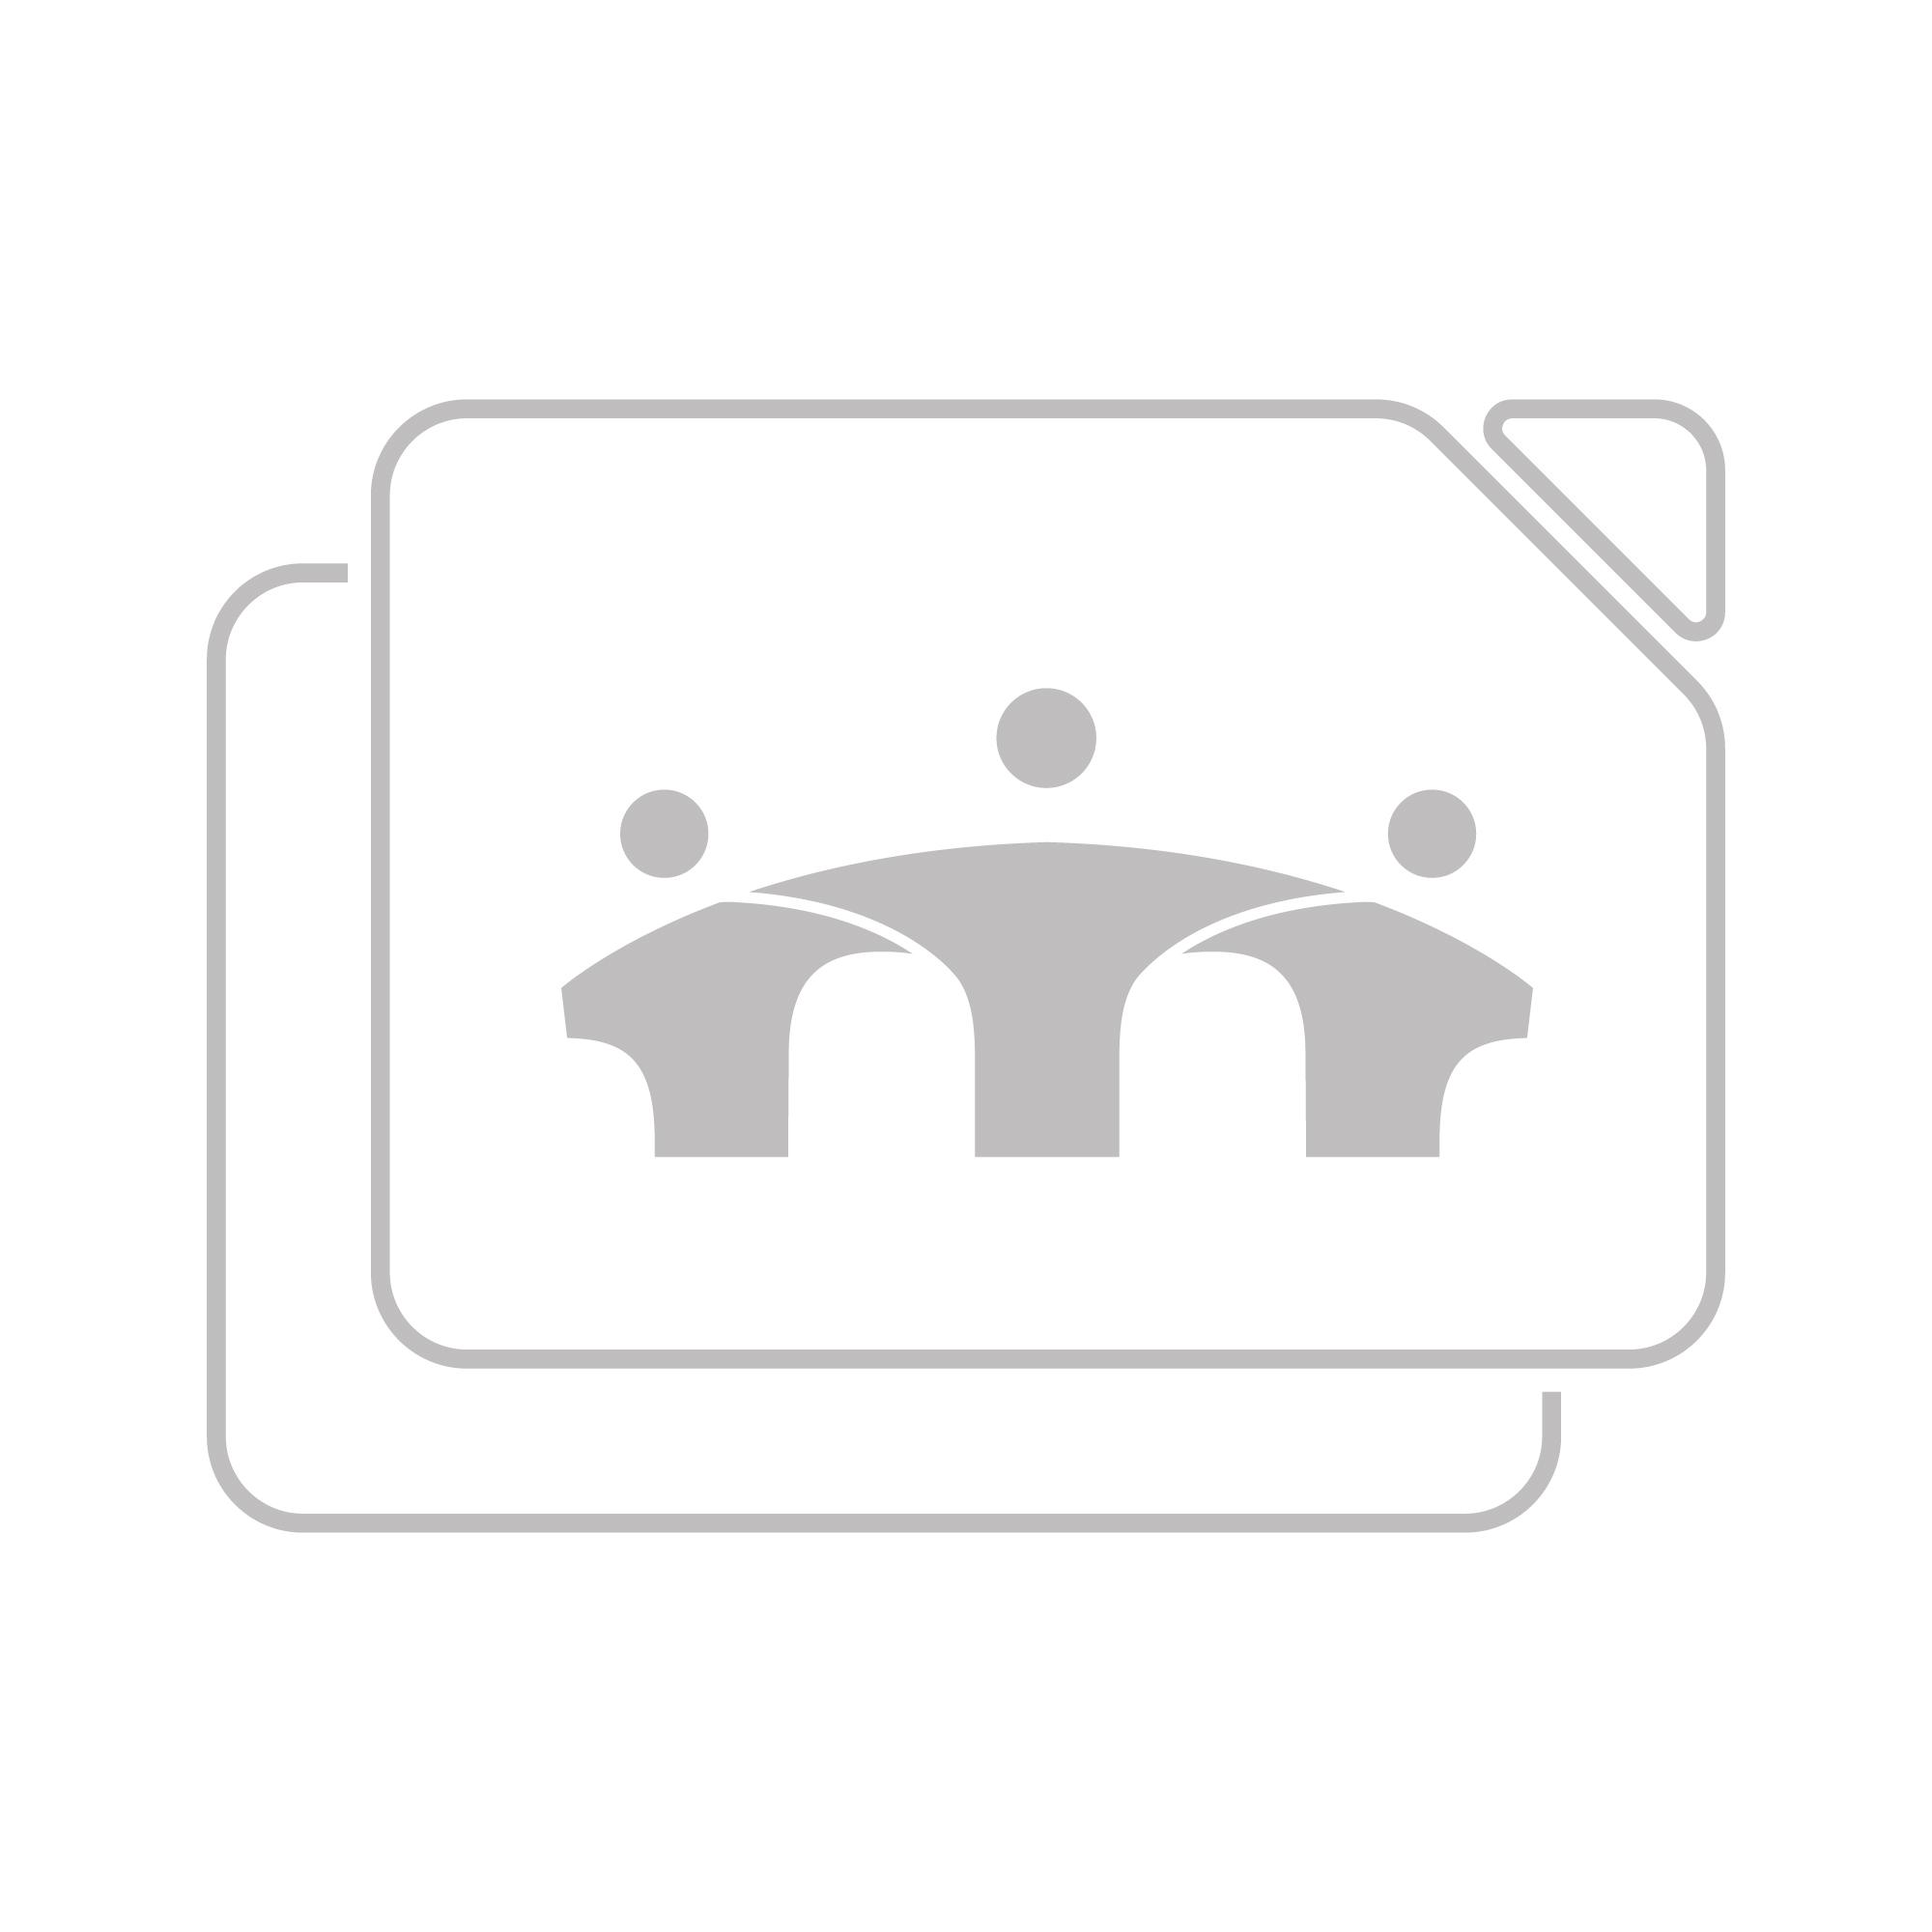 SanDisk WD_BLACK D30 Game Drive SSD 2TB